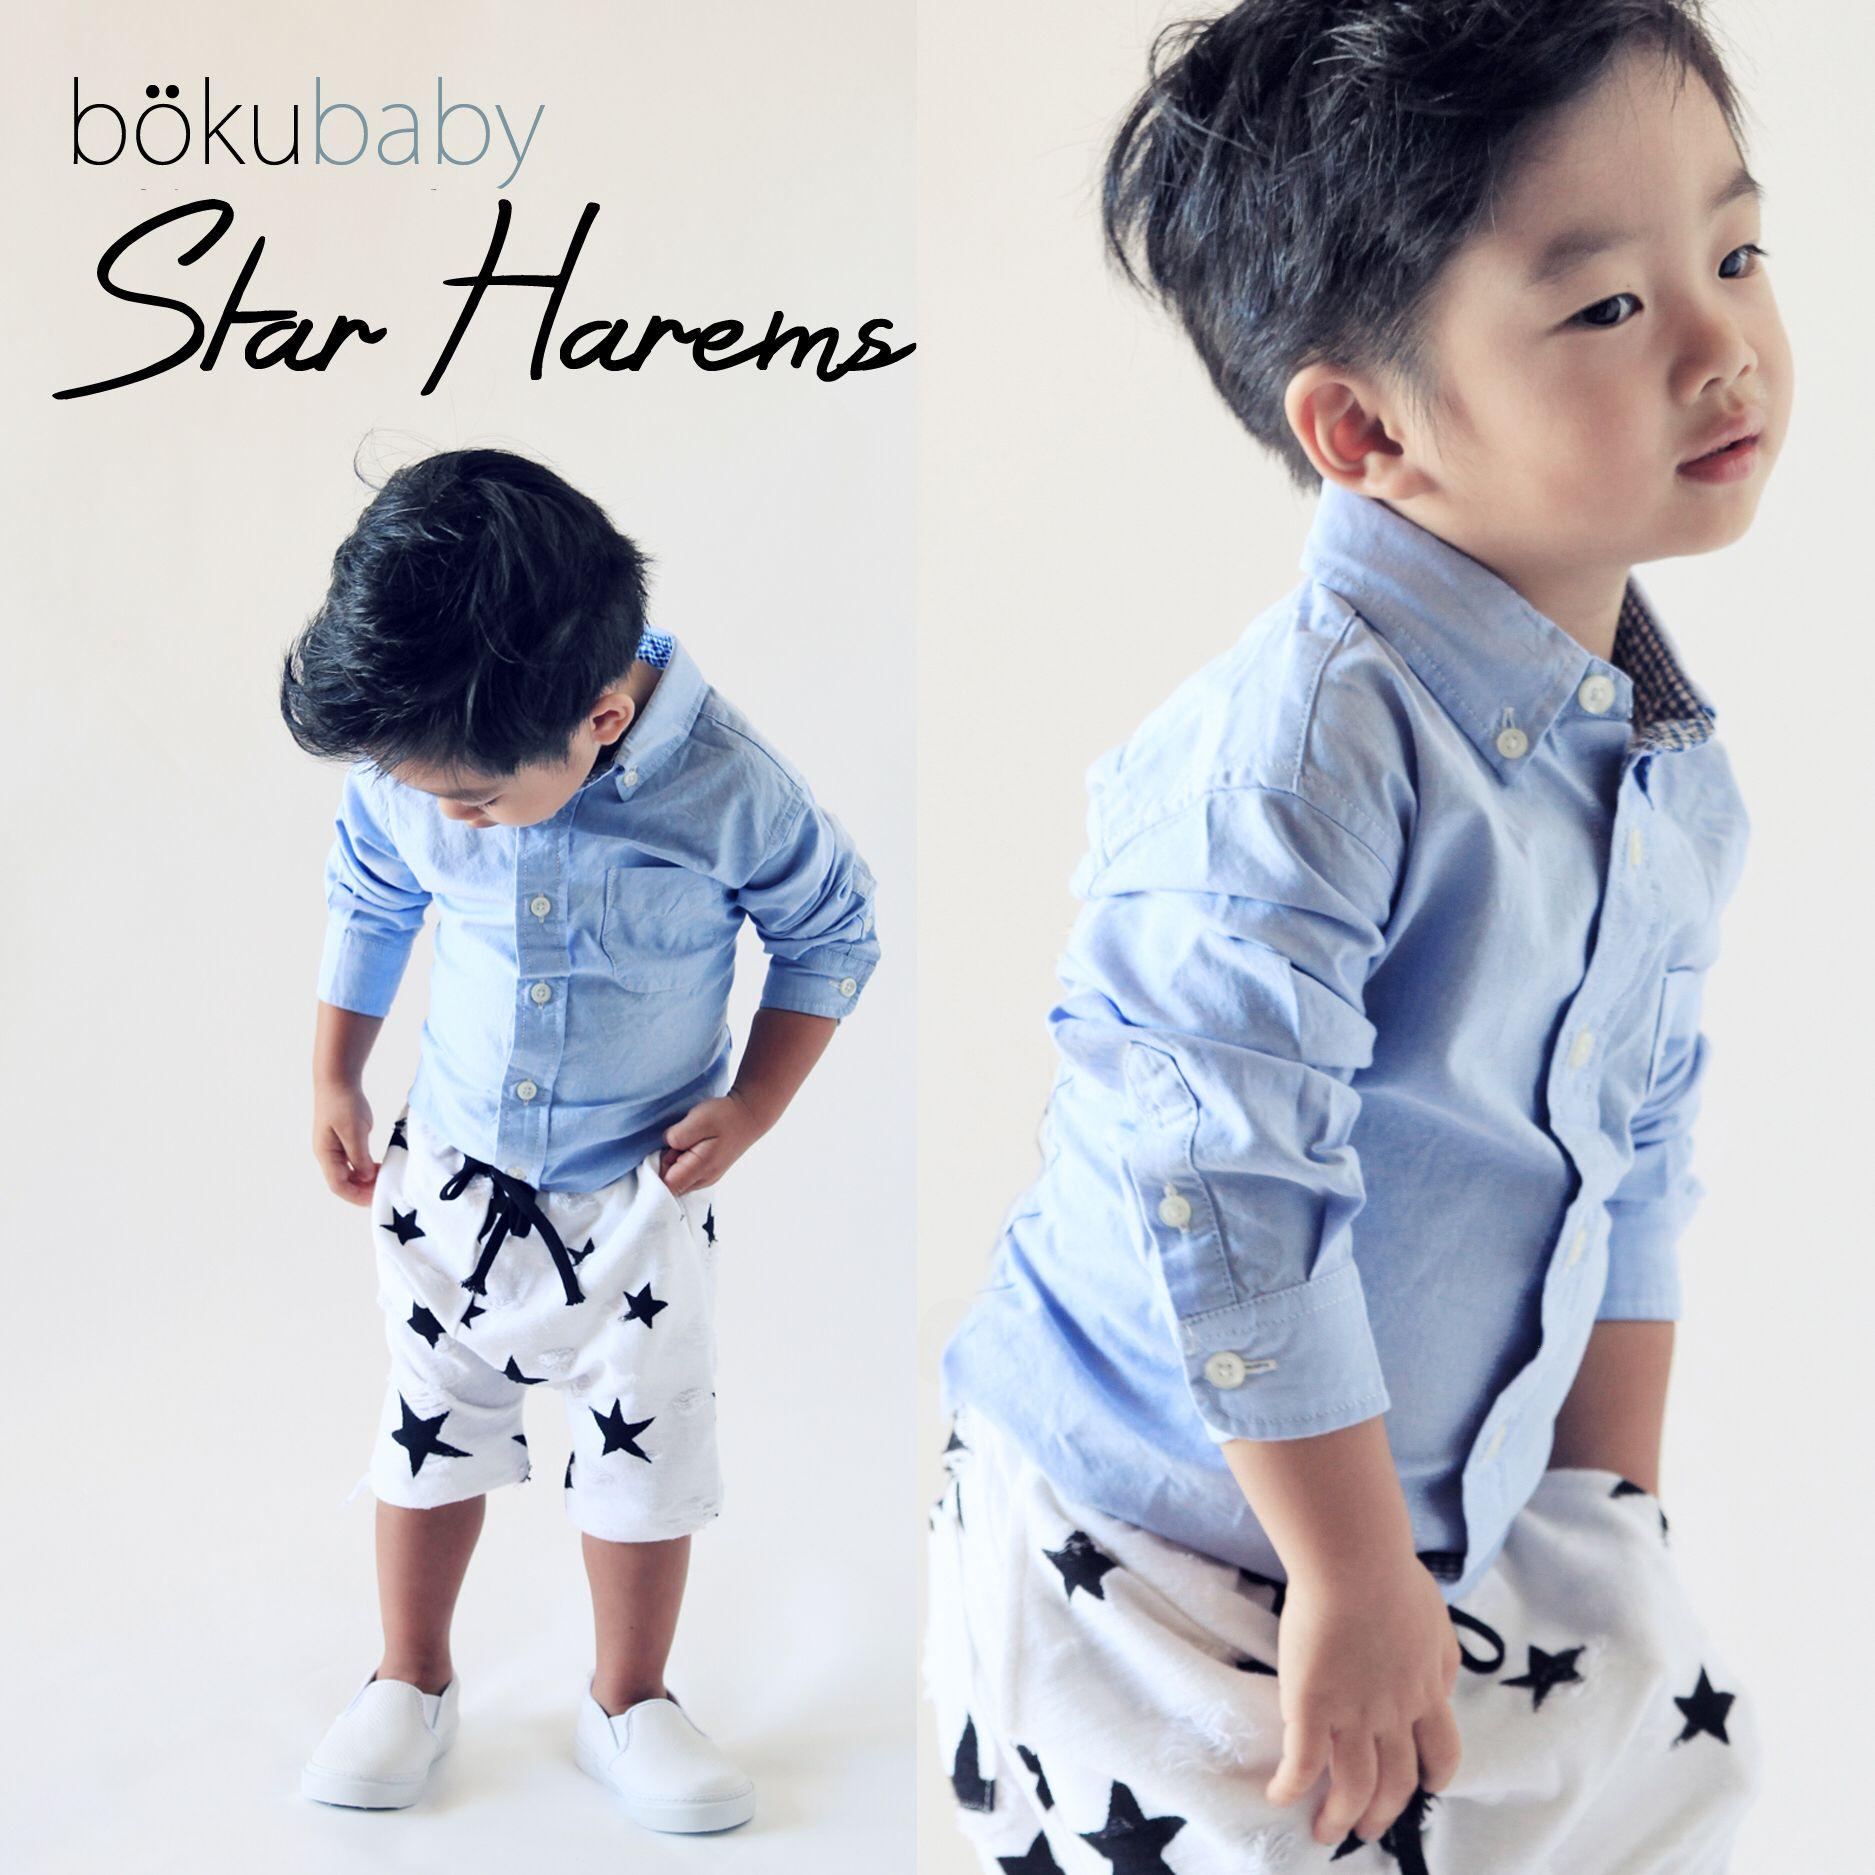 Baby boy style street style baby boy fashion trendy kids stylish